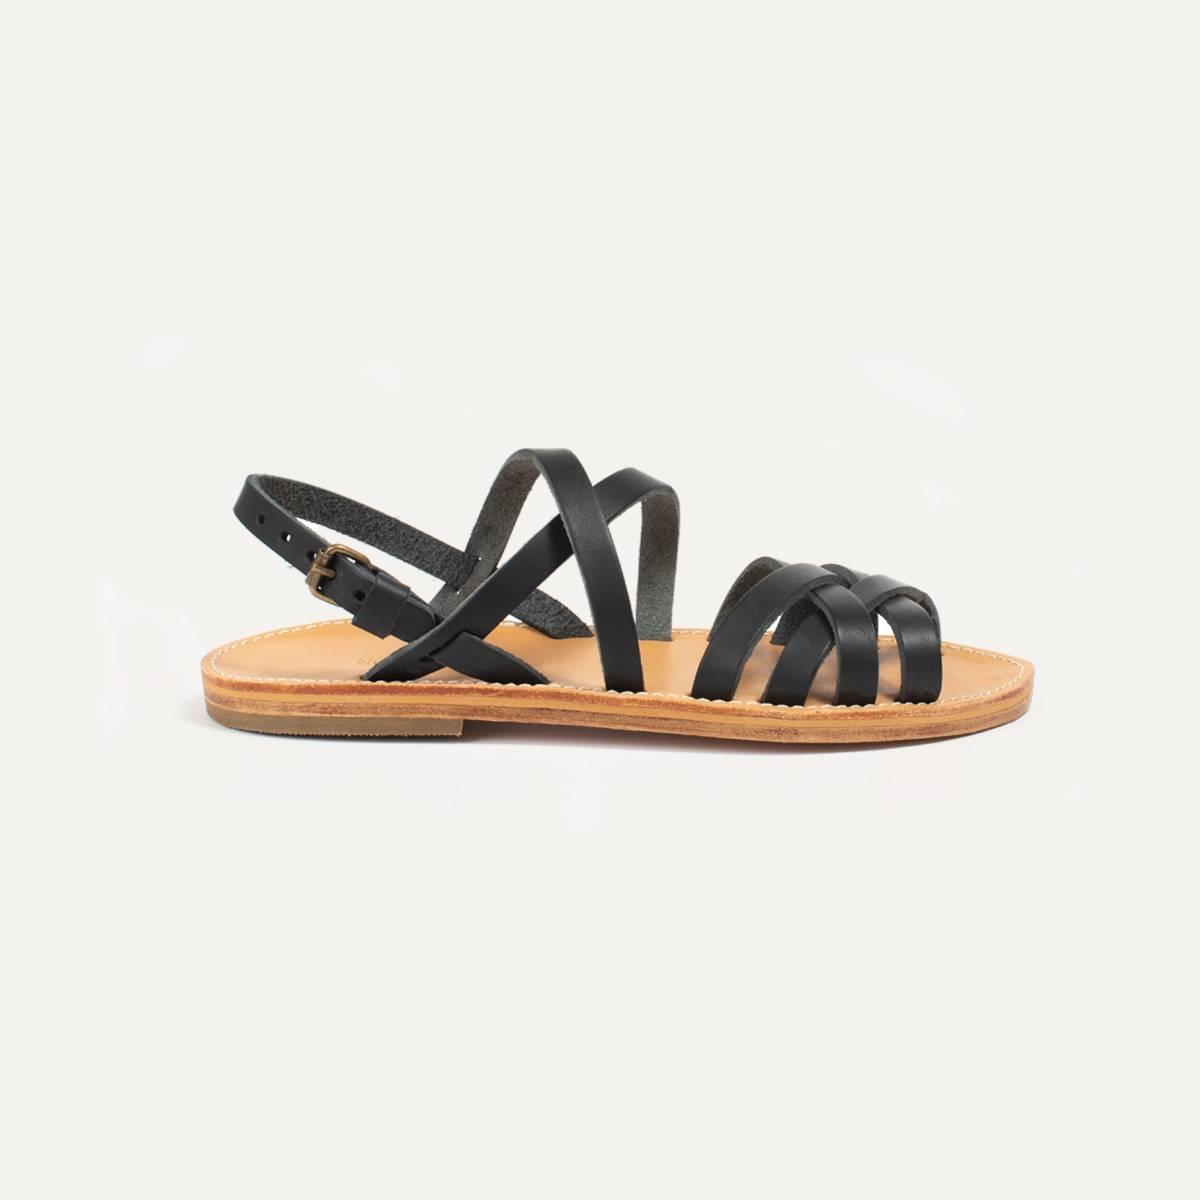 Majour leather sandals - Black (image n°5)